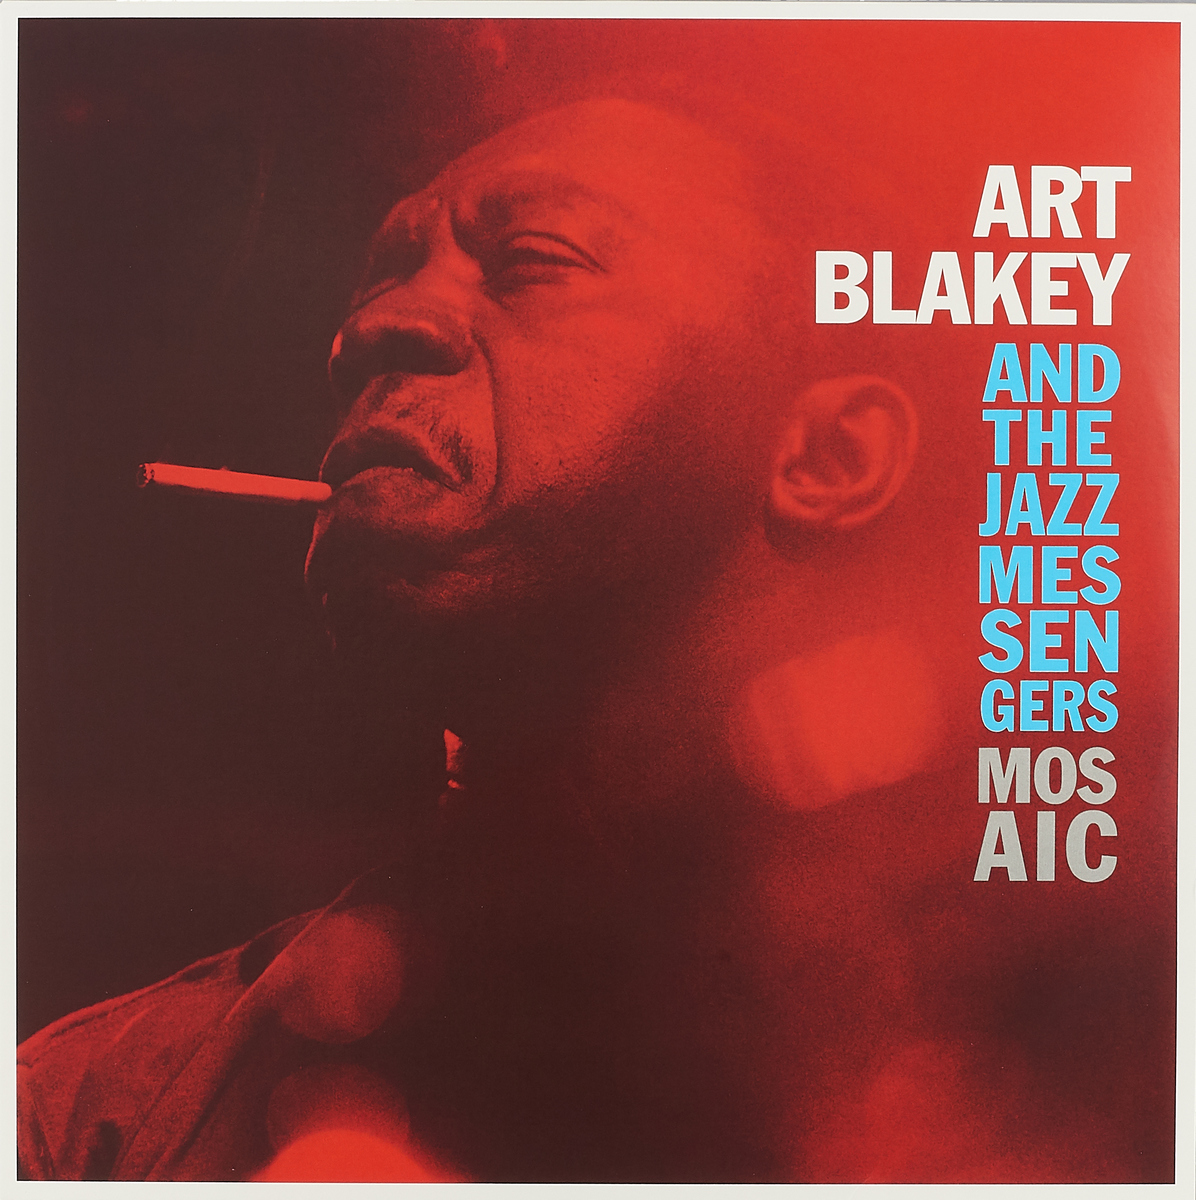 Арт Блэйки,The Jazz Messengers Art Blakey And The Jazz Messengers. Mosaic (LP) art blakey quintet art blakey quintet a night at birdland volume 2 lp